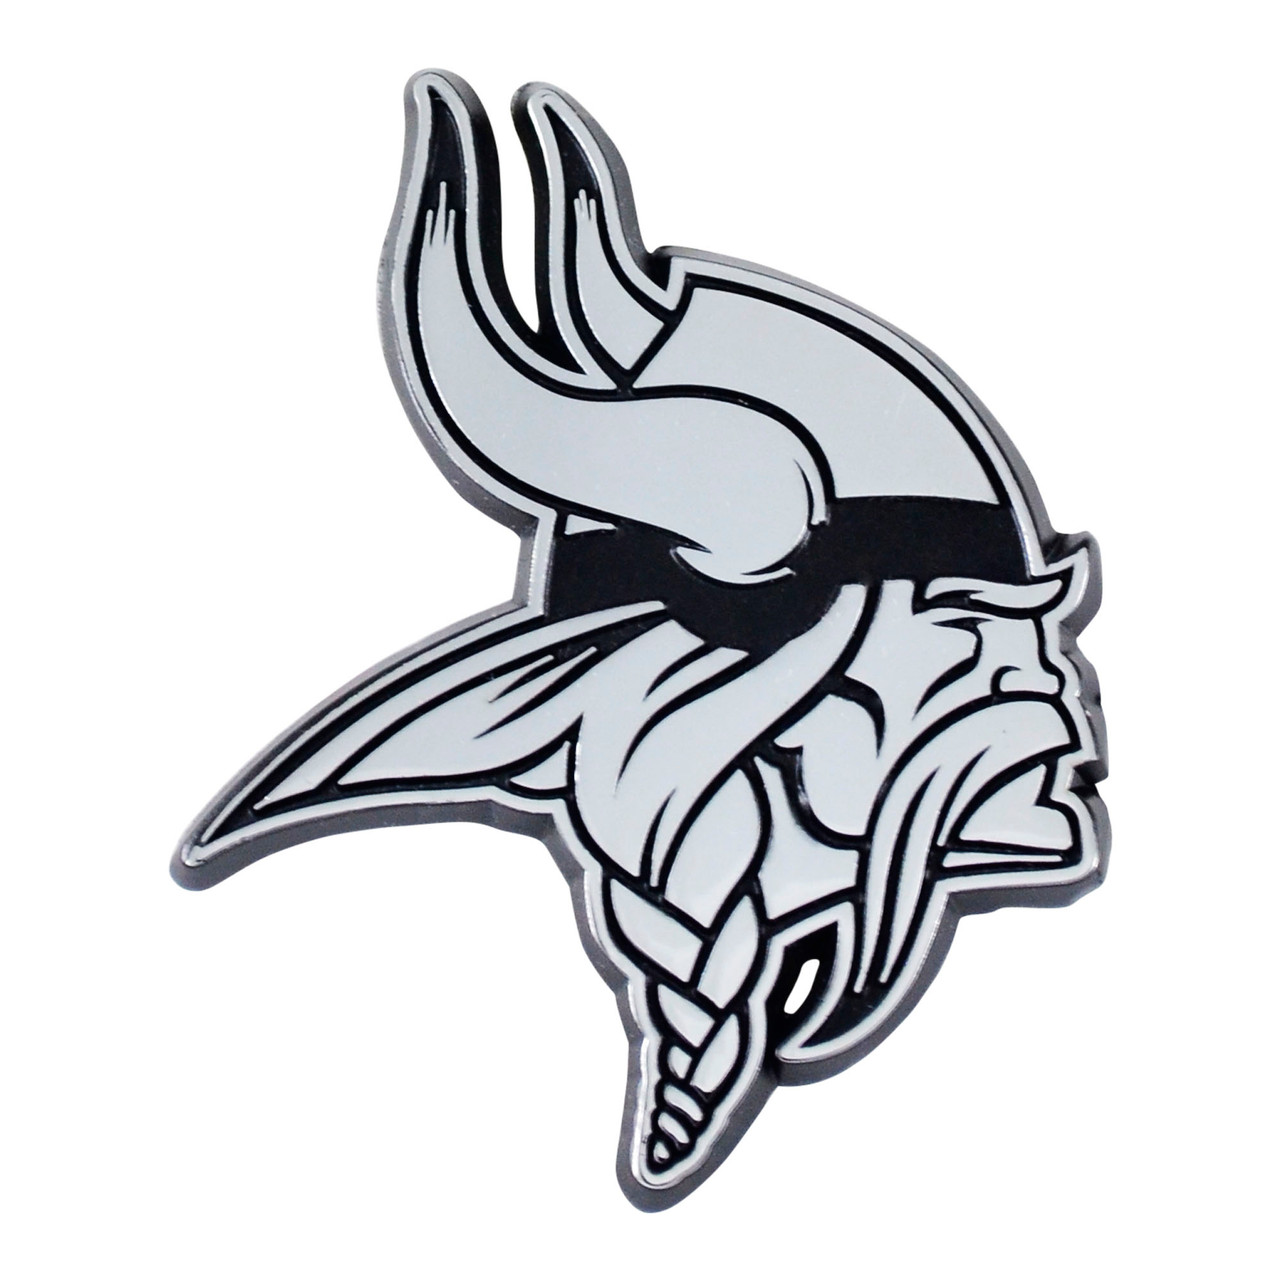 Minnesota Vikings Auto Emblem Premium Metal Chrome